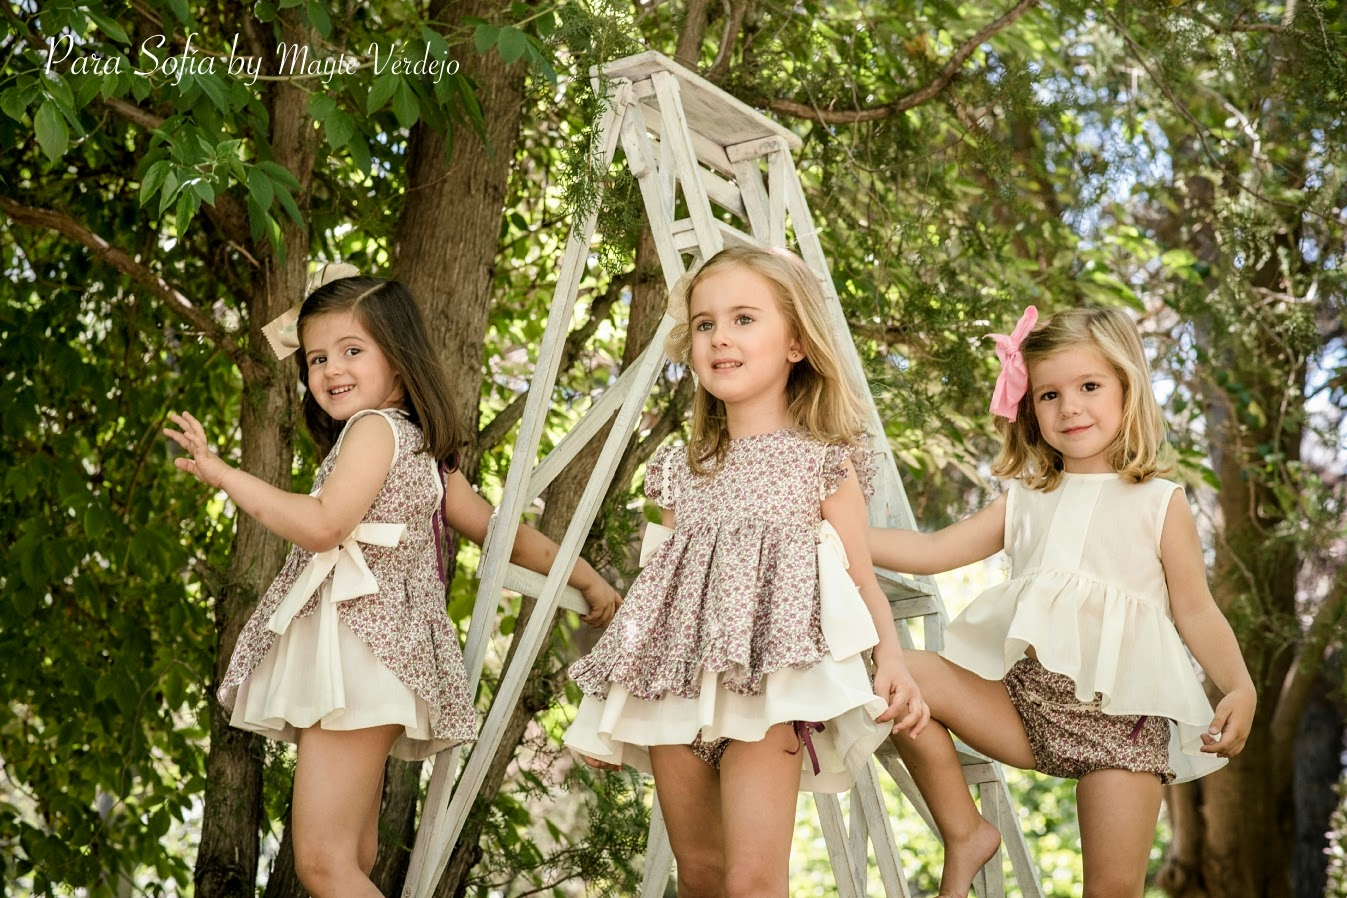 baf1eeb00 Para Sofia moda infantil primavera verano